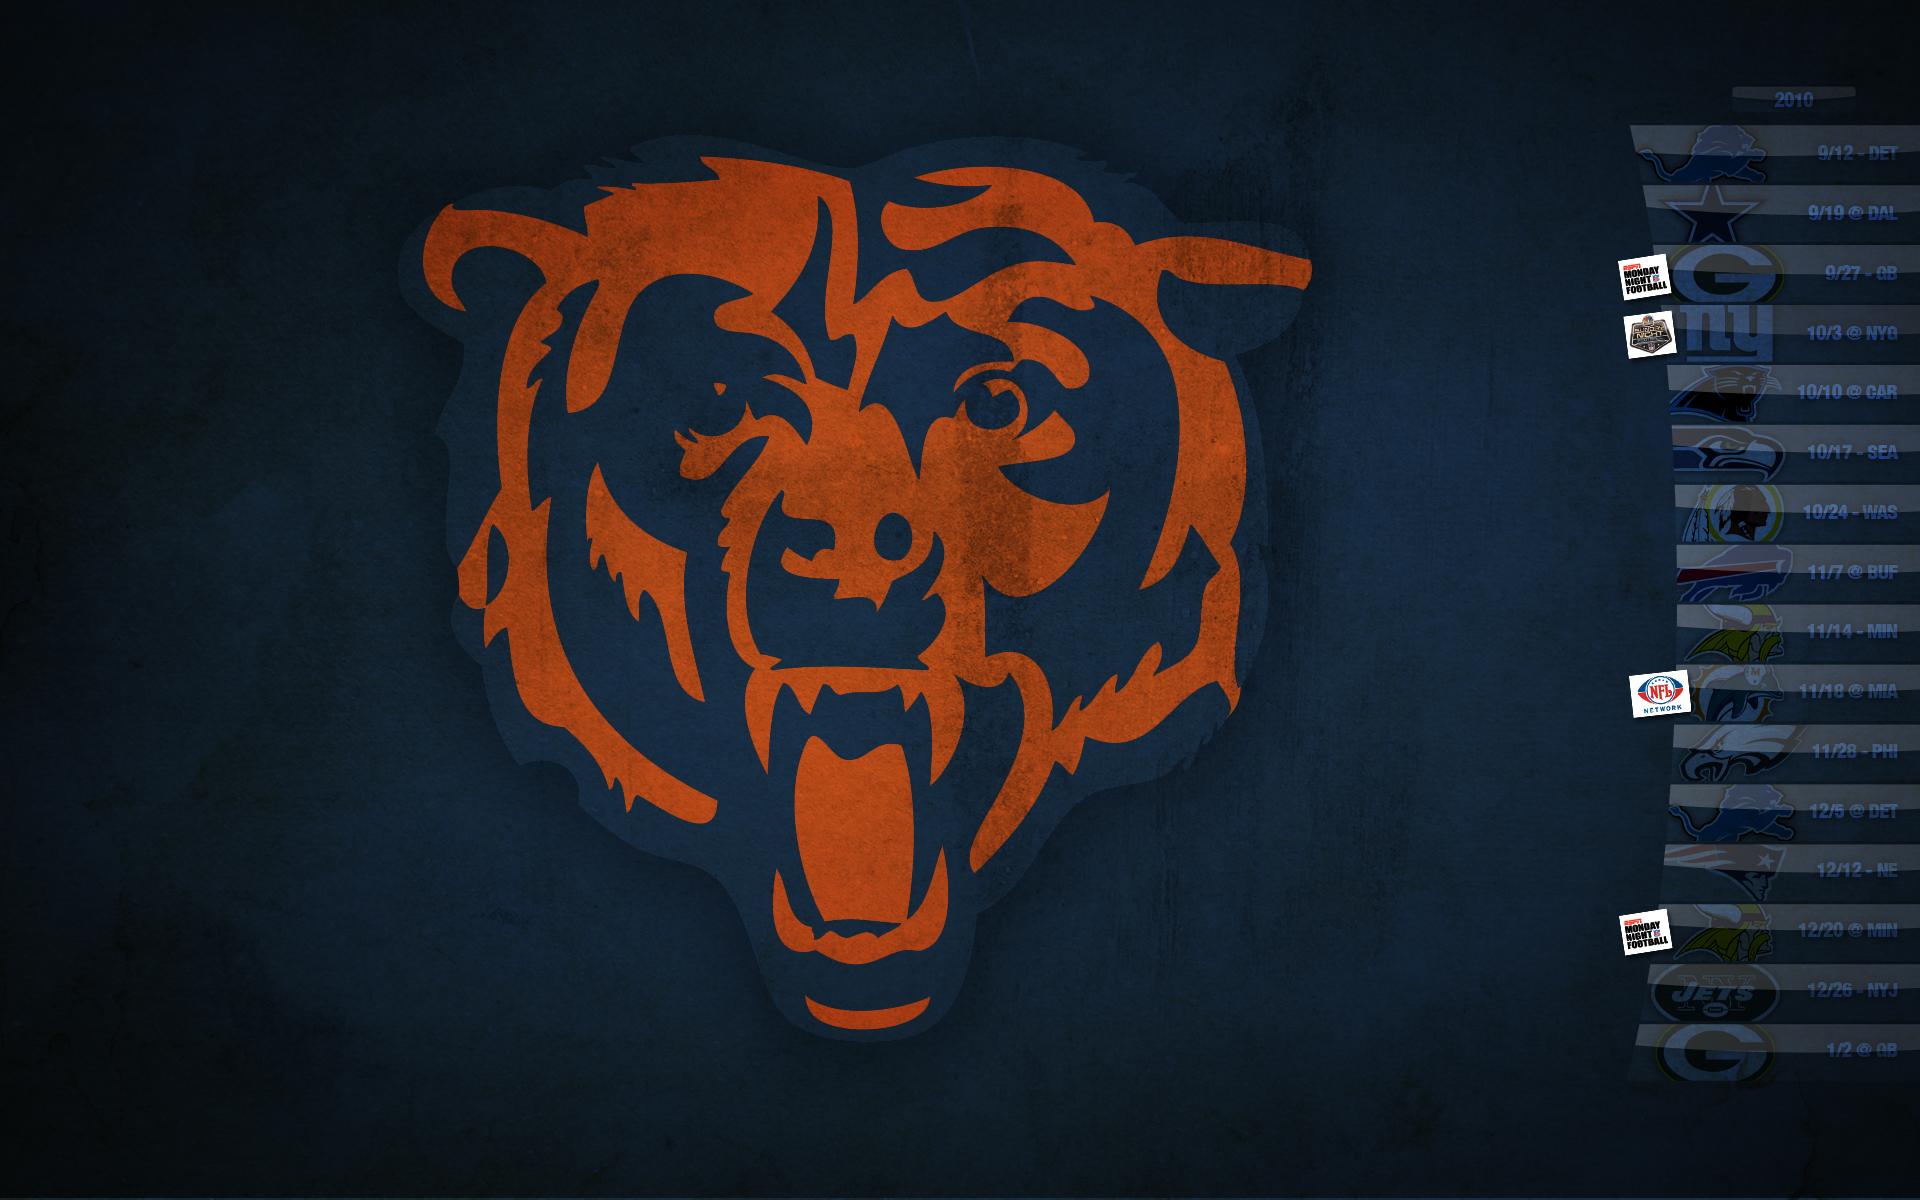 Chicago Bears wallpaper   941225 1920x1200